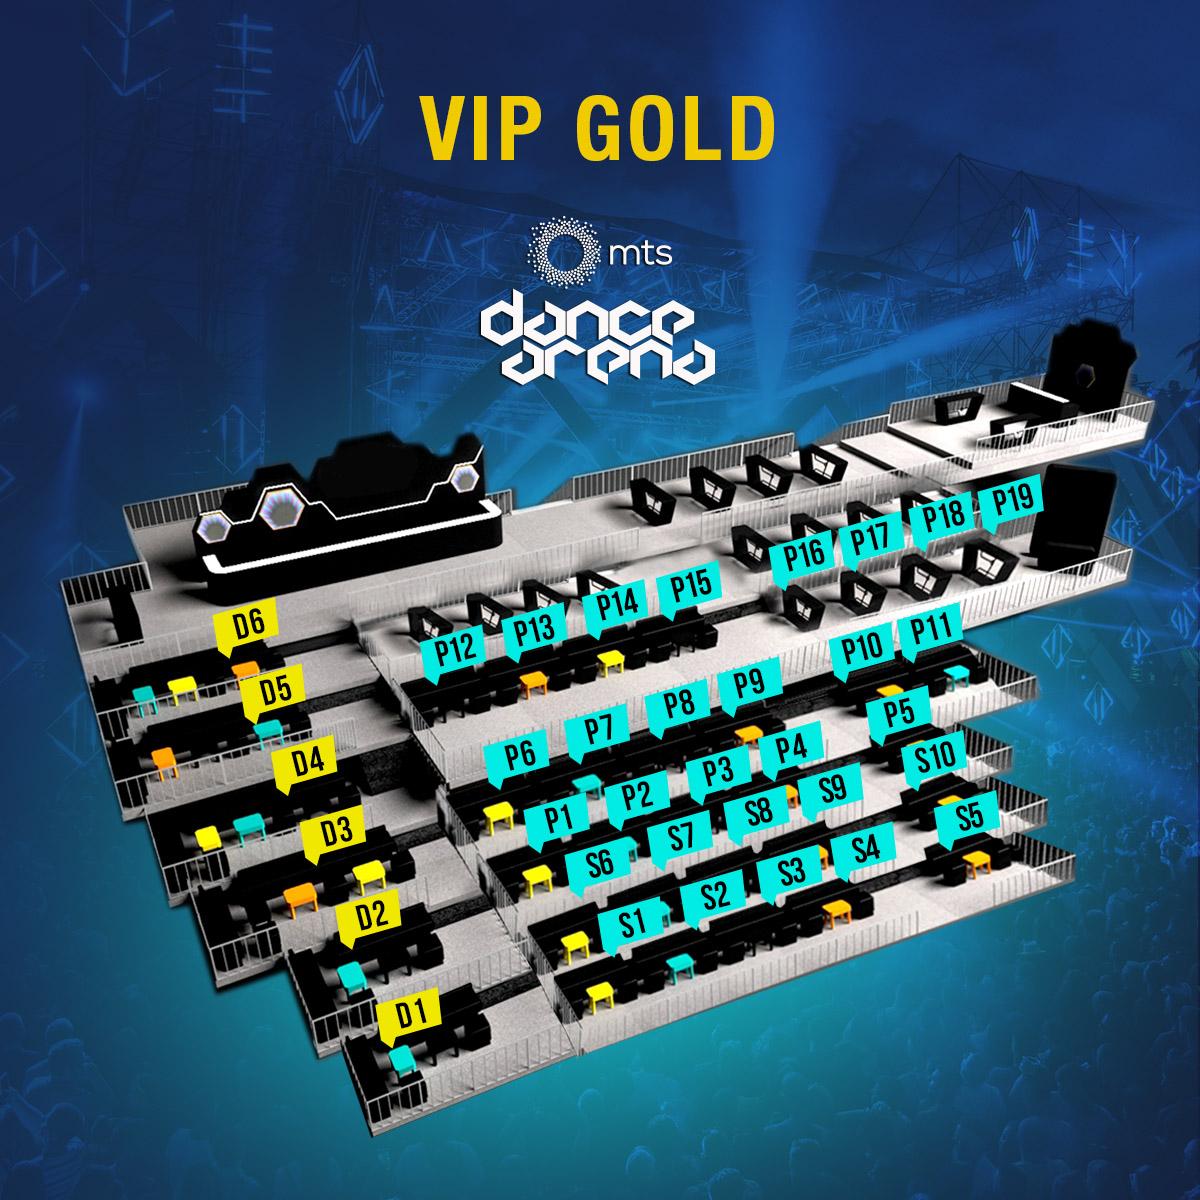 VIP GOLD mapa